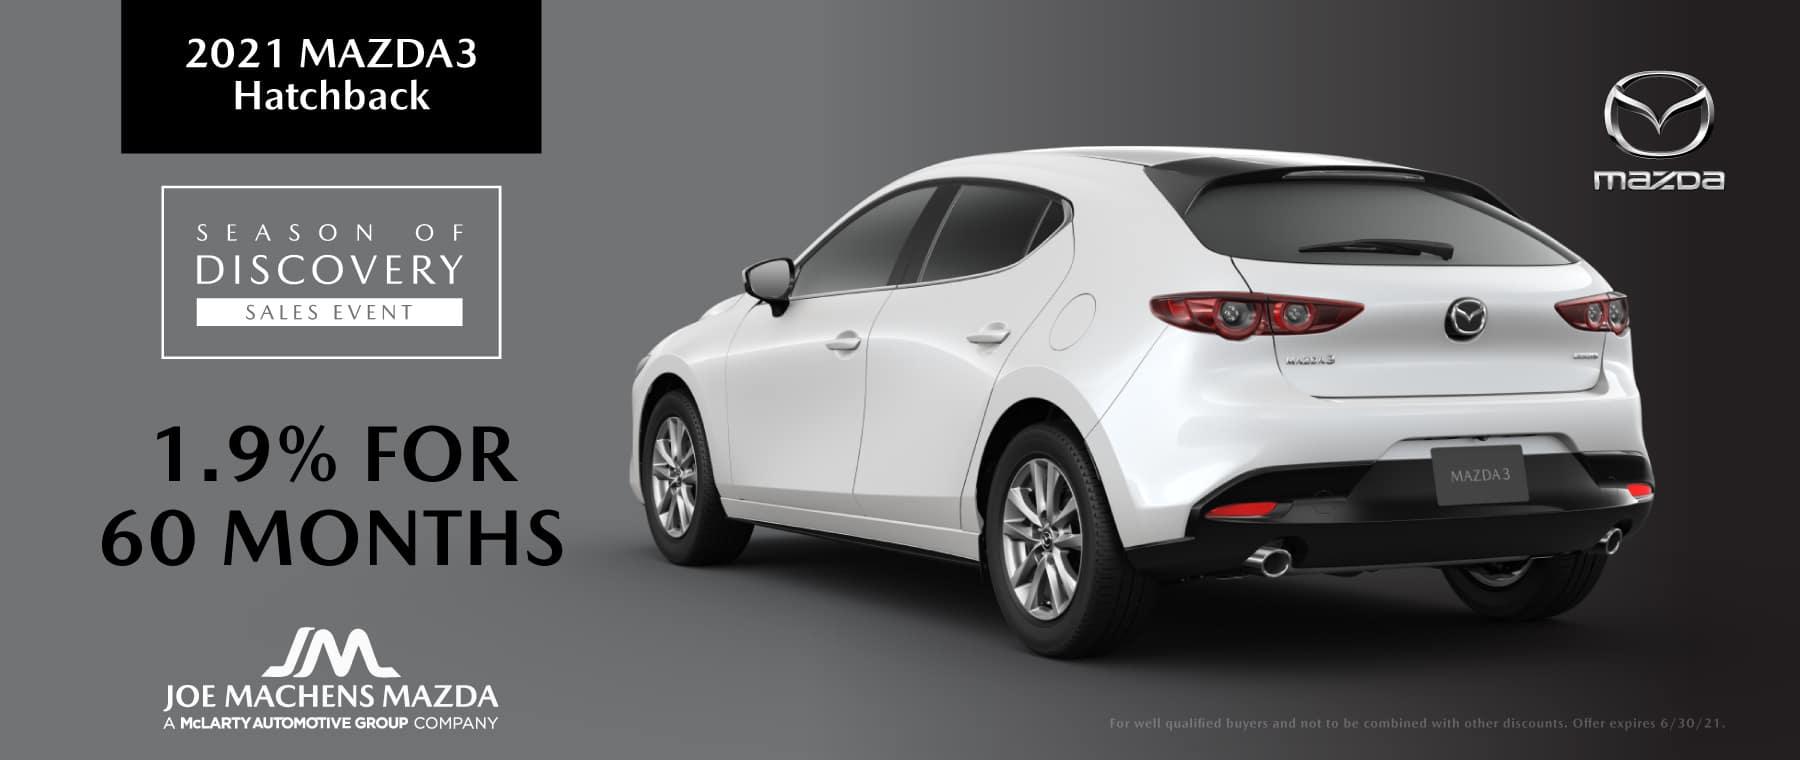 Machens-Mazda-Incentives-06-21_Slider-Mazda3-Hatchback